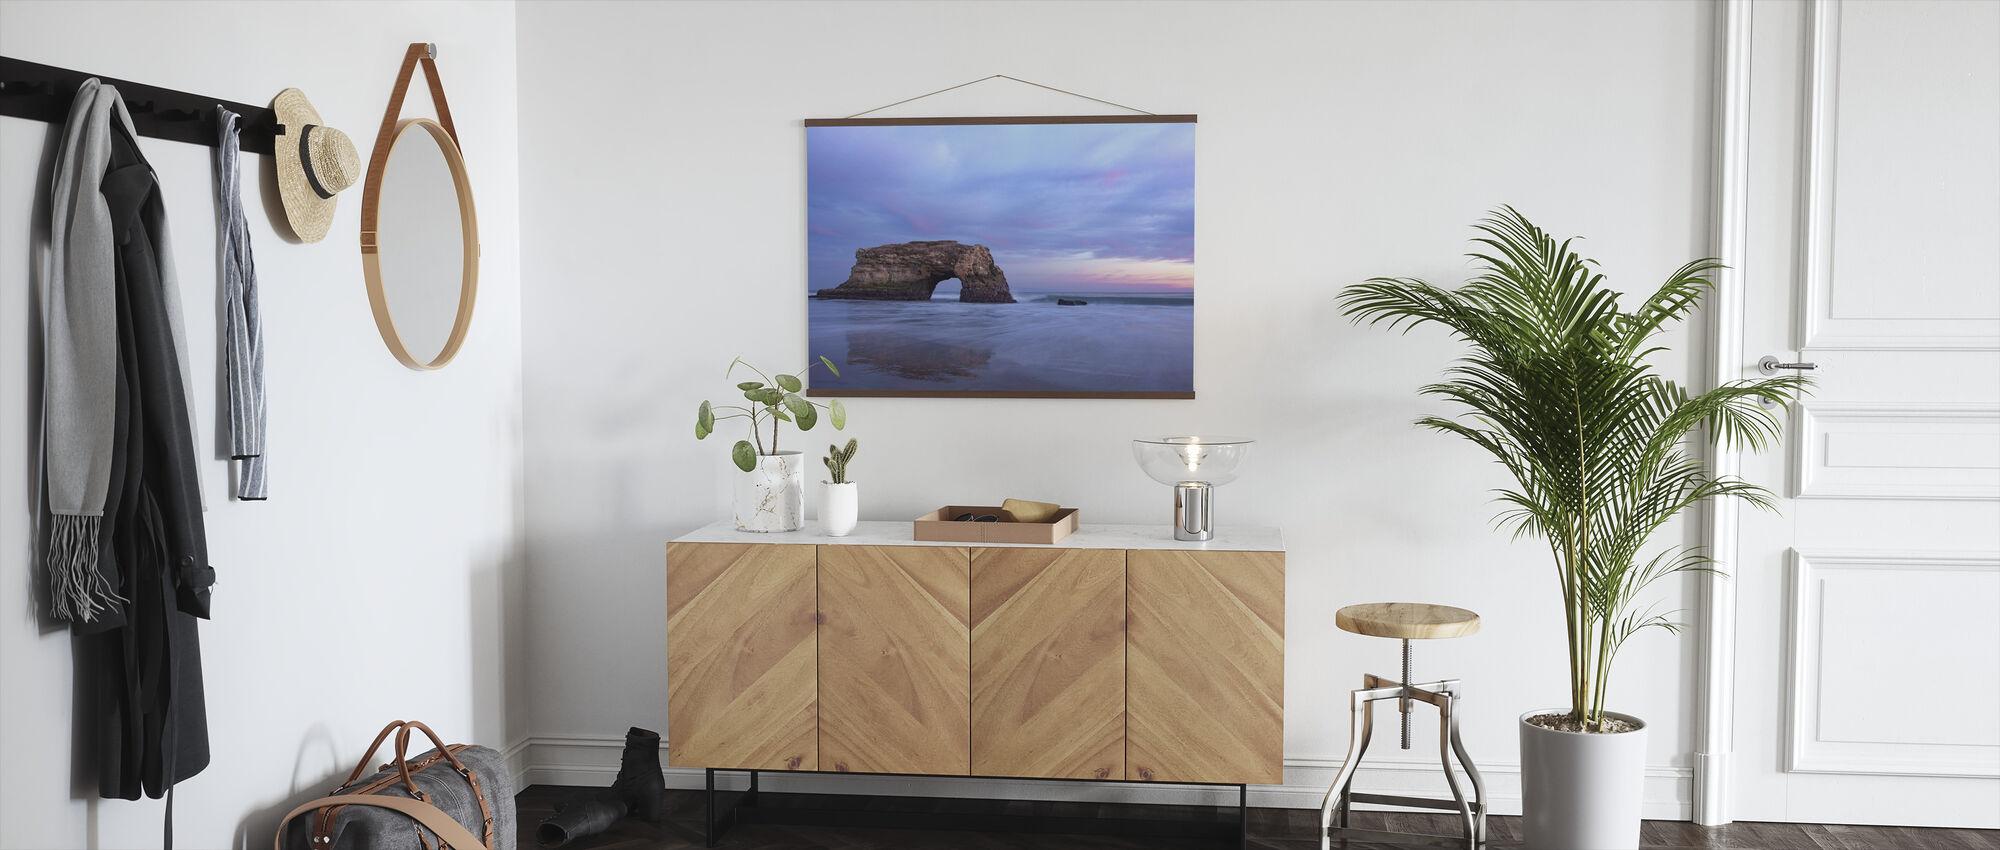 Serenity Shoreline - Poster - Hallway